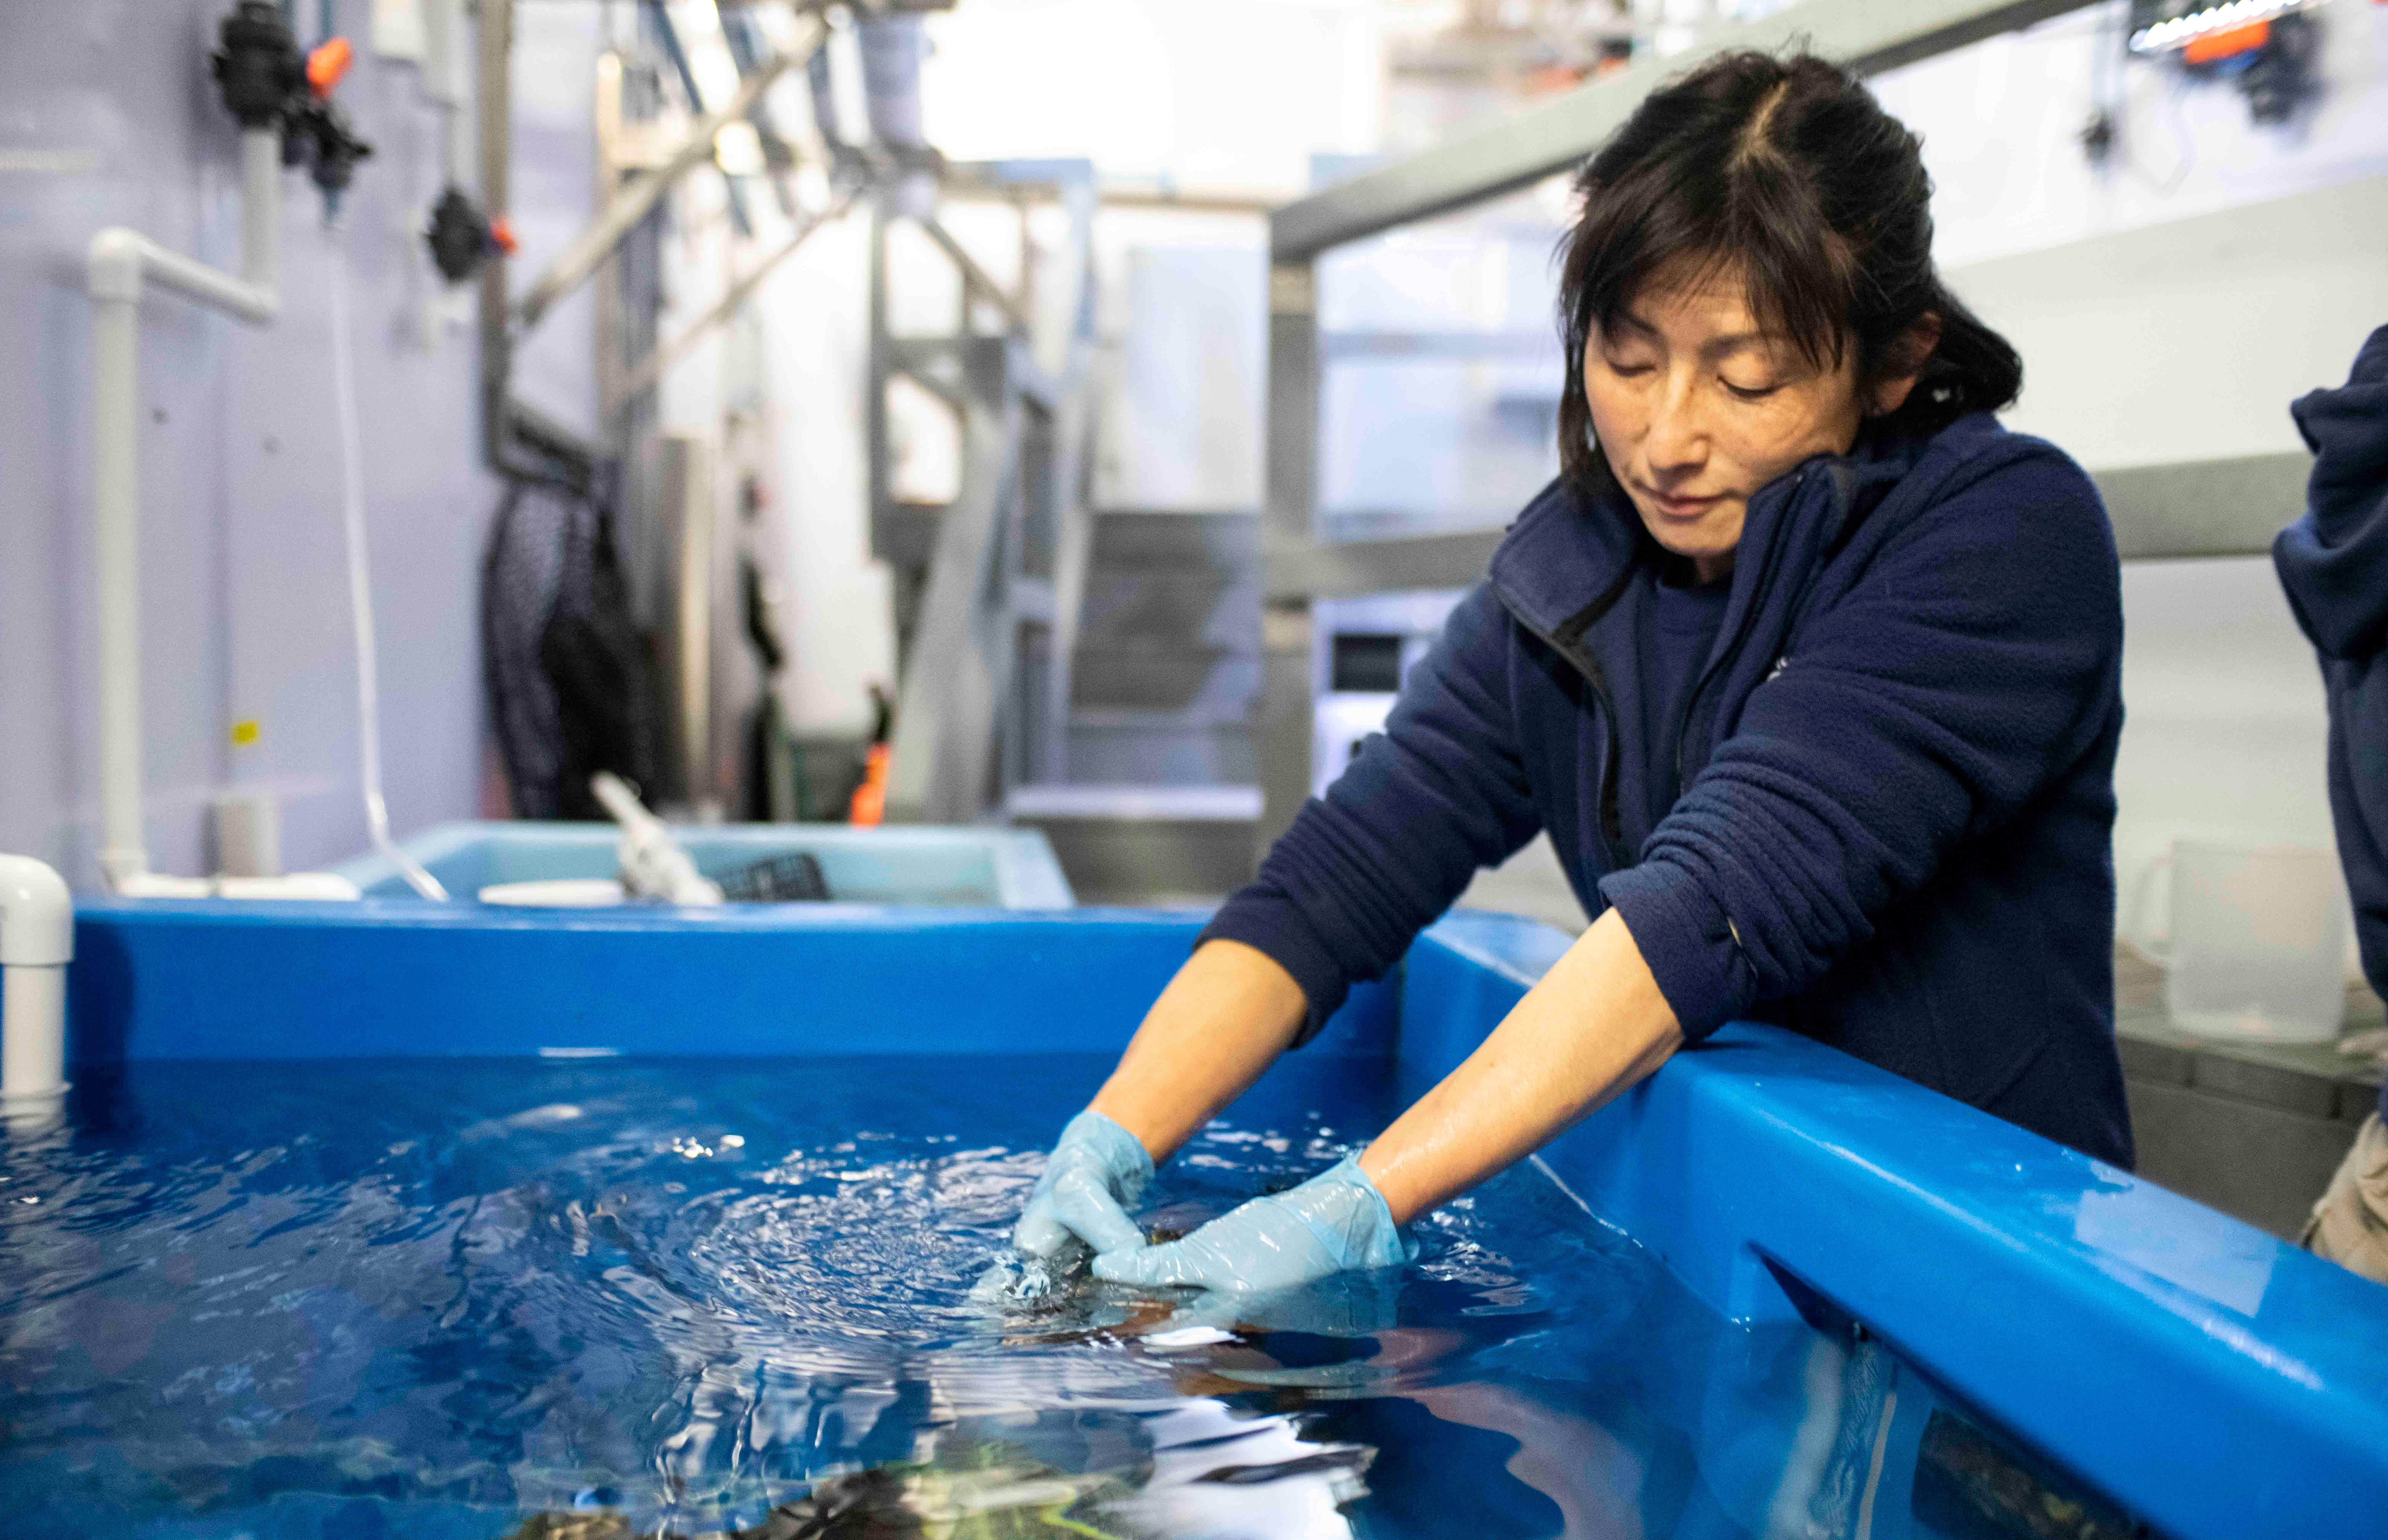 aquarist holding fish in tank